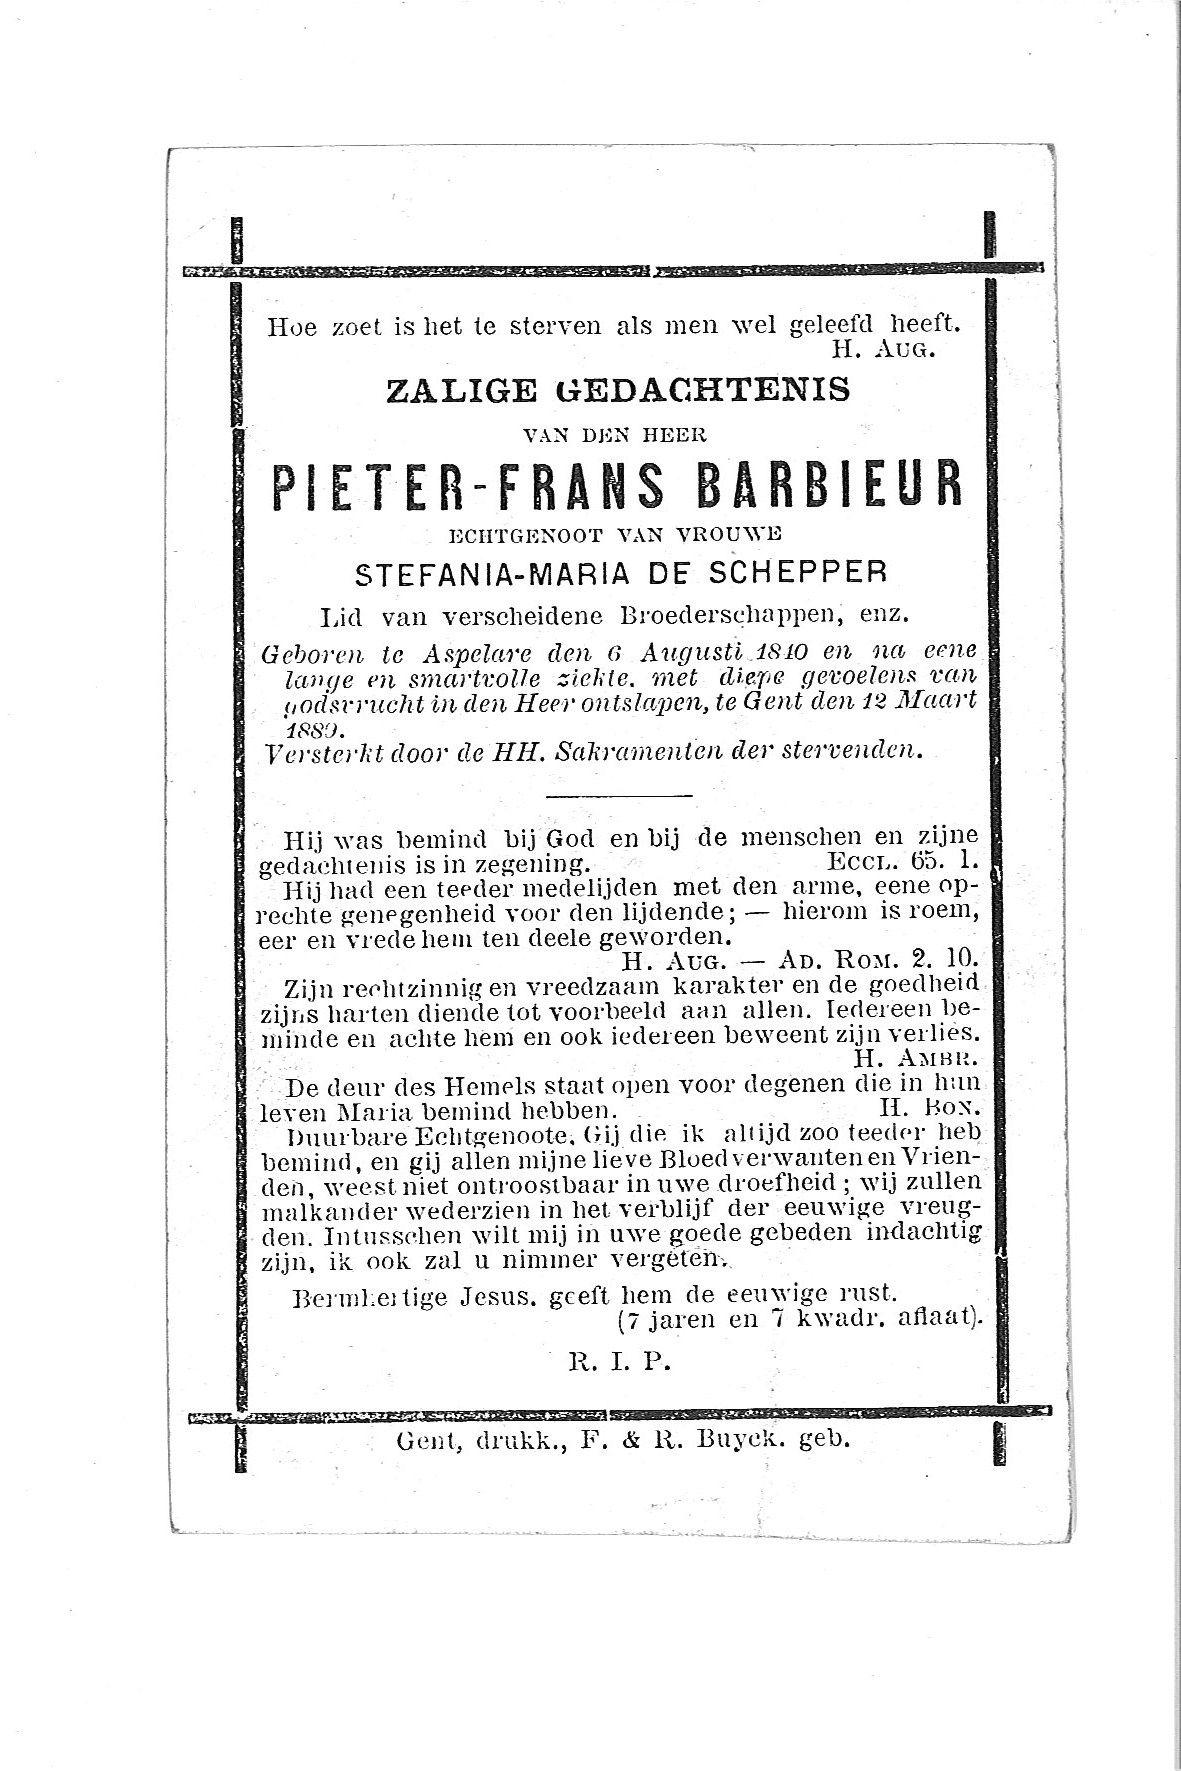 pieter-frans(1889)20090604114516_00028.jpg